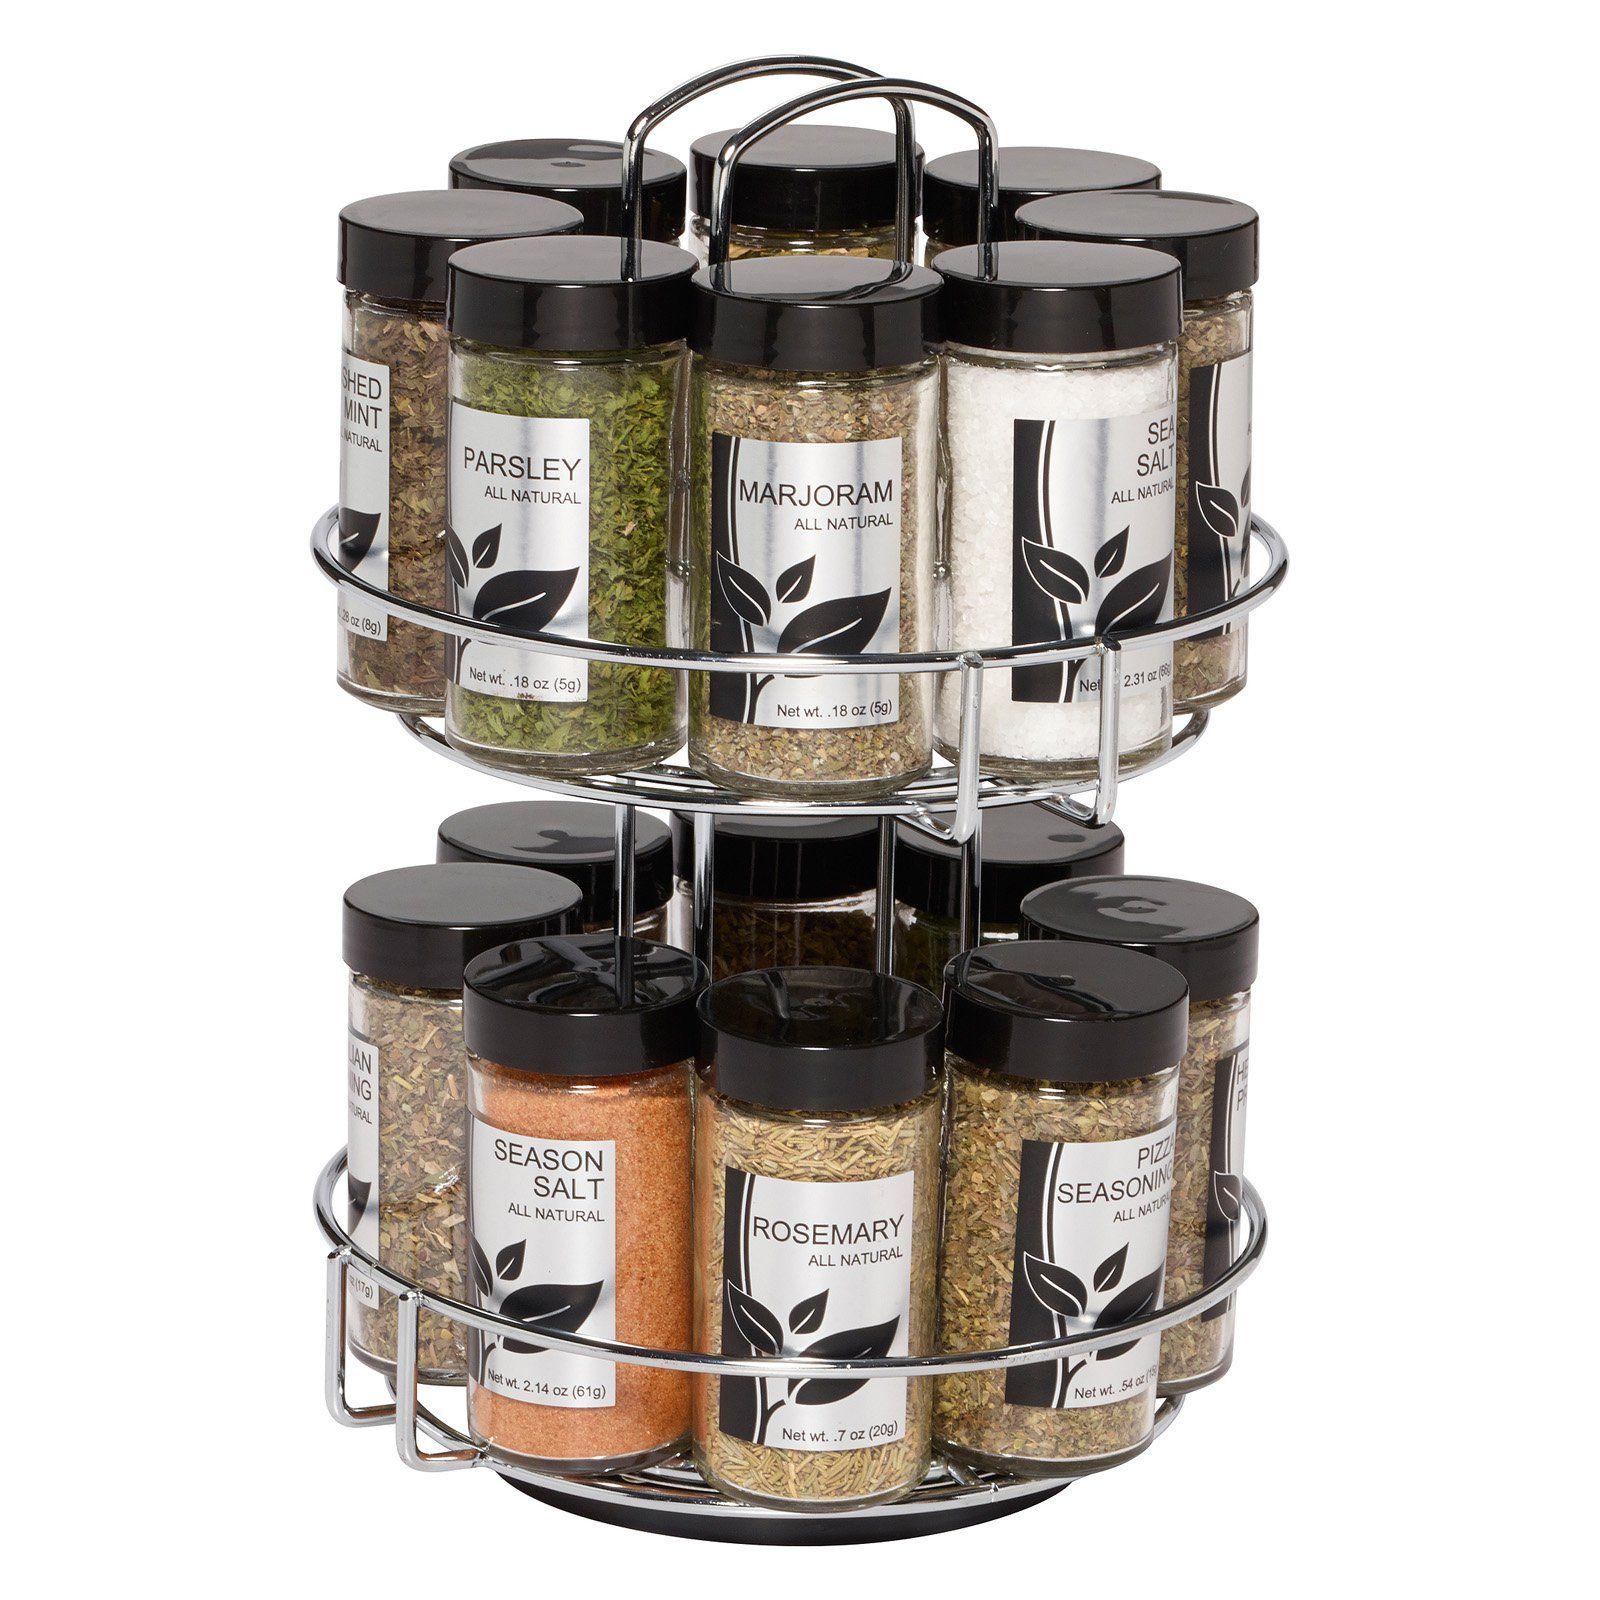 Kamenstein 16 Jar Spice Rack Spice Rack Walmart Countertop